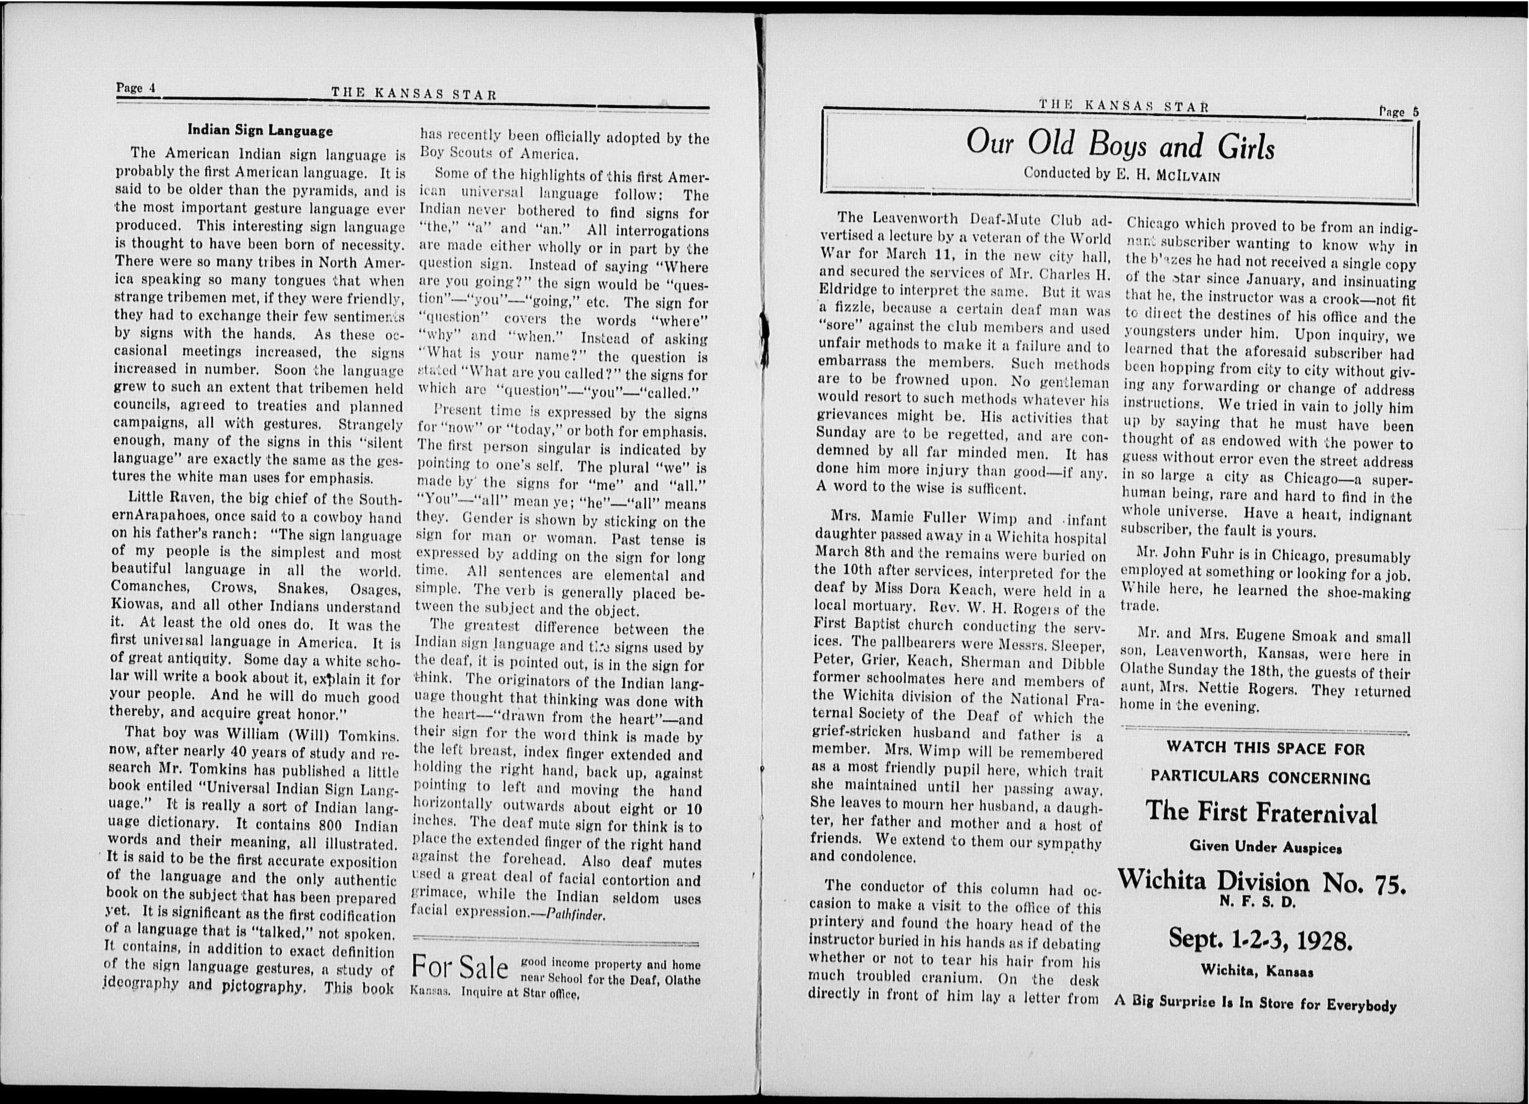 The Kansas Star, volume 51, number 11 - 4-5